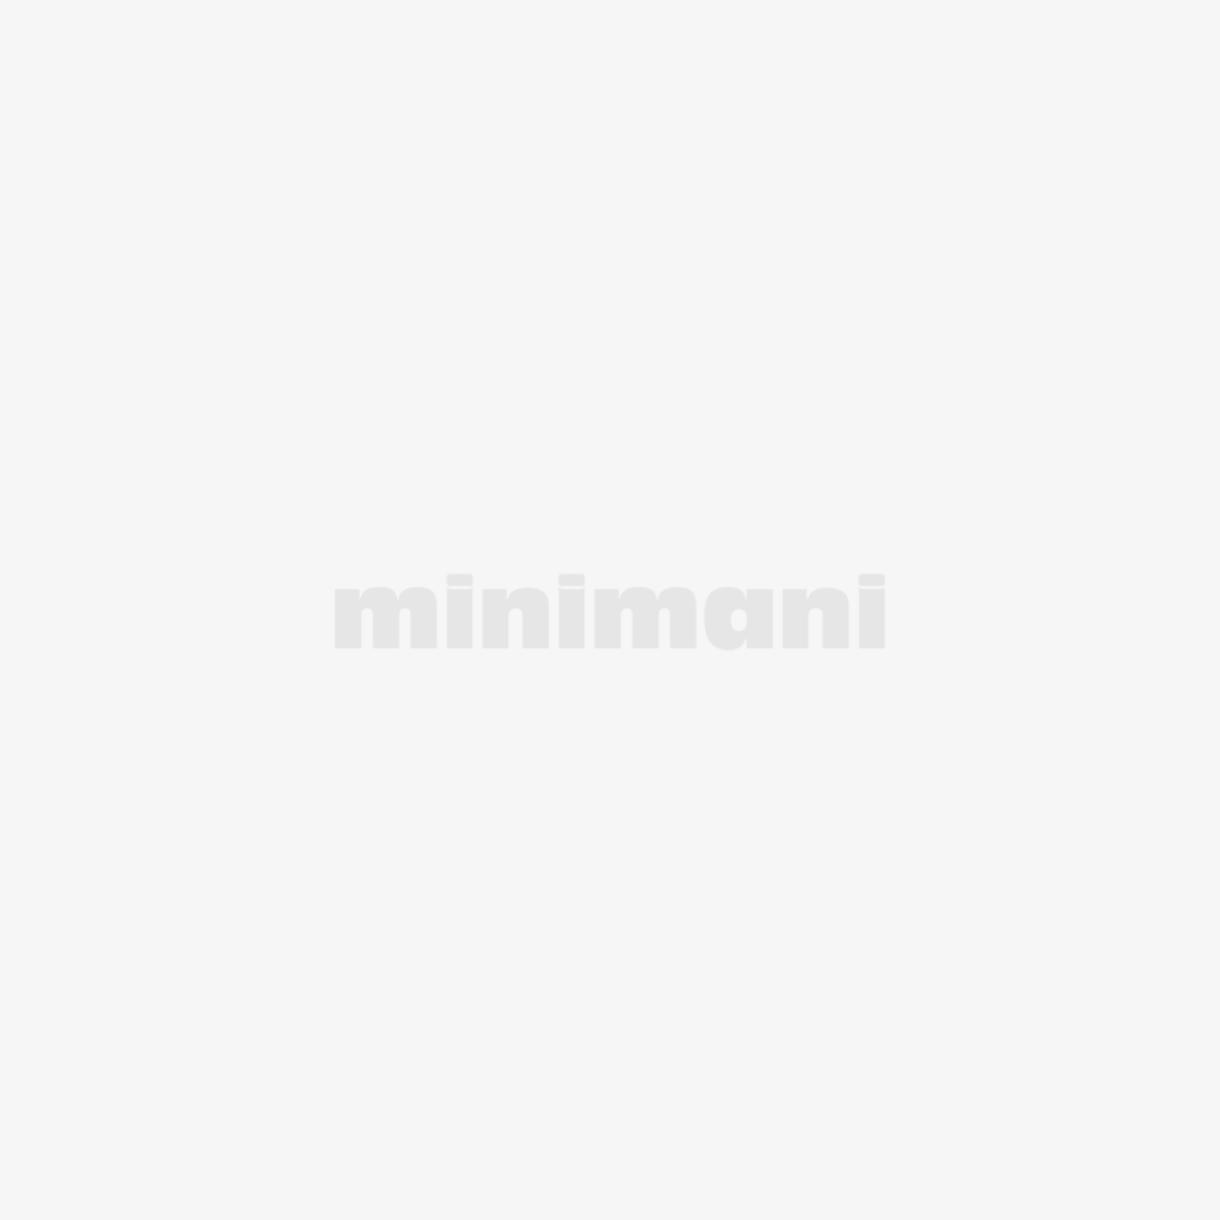 M-FILTER ILMANSUODATIN  MAP 6916 FORD MONDEO 1.8I.2.0I